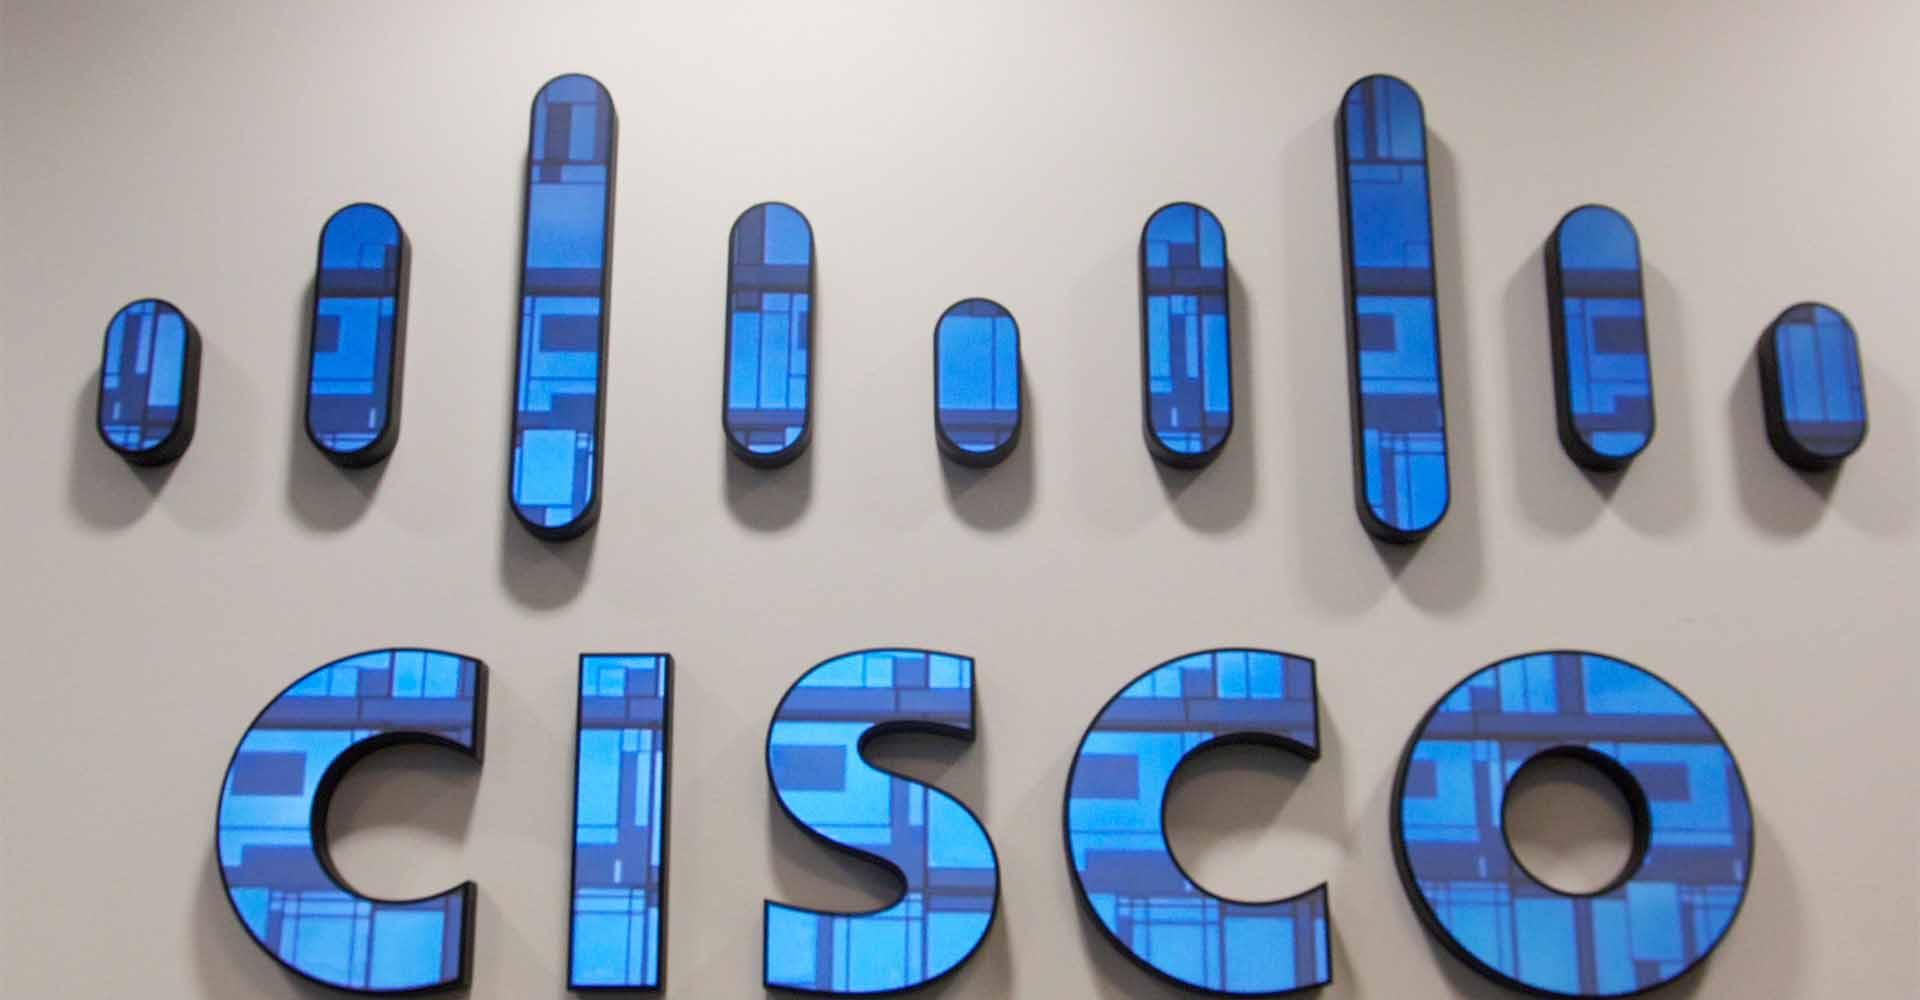 Switch Cisco 2960x Xtech Symbols And